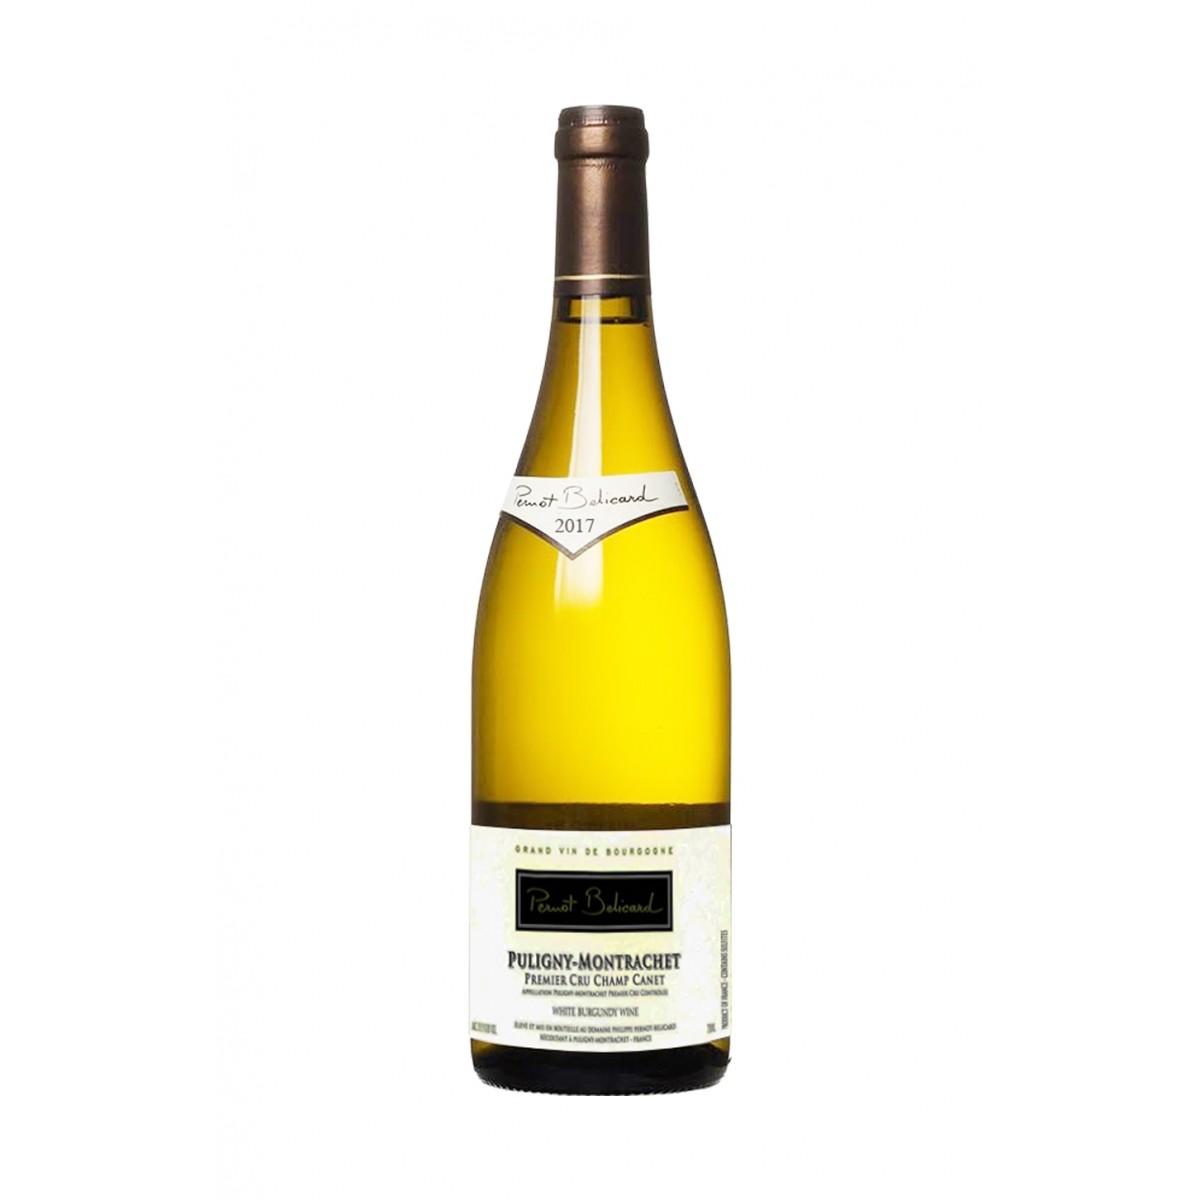 Puligny Montrachet 1er Cru Champ Canet 2017 - Domaine Pernot Belicard